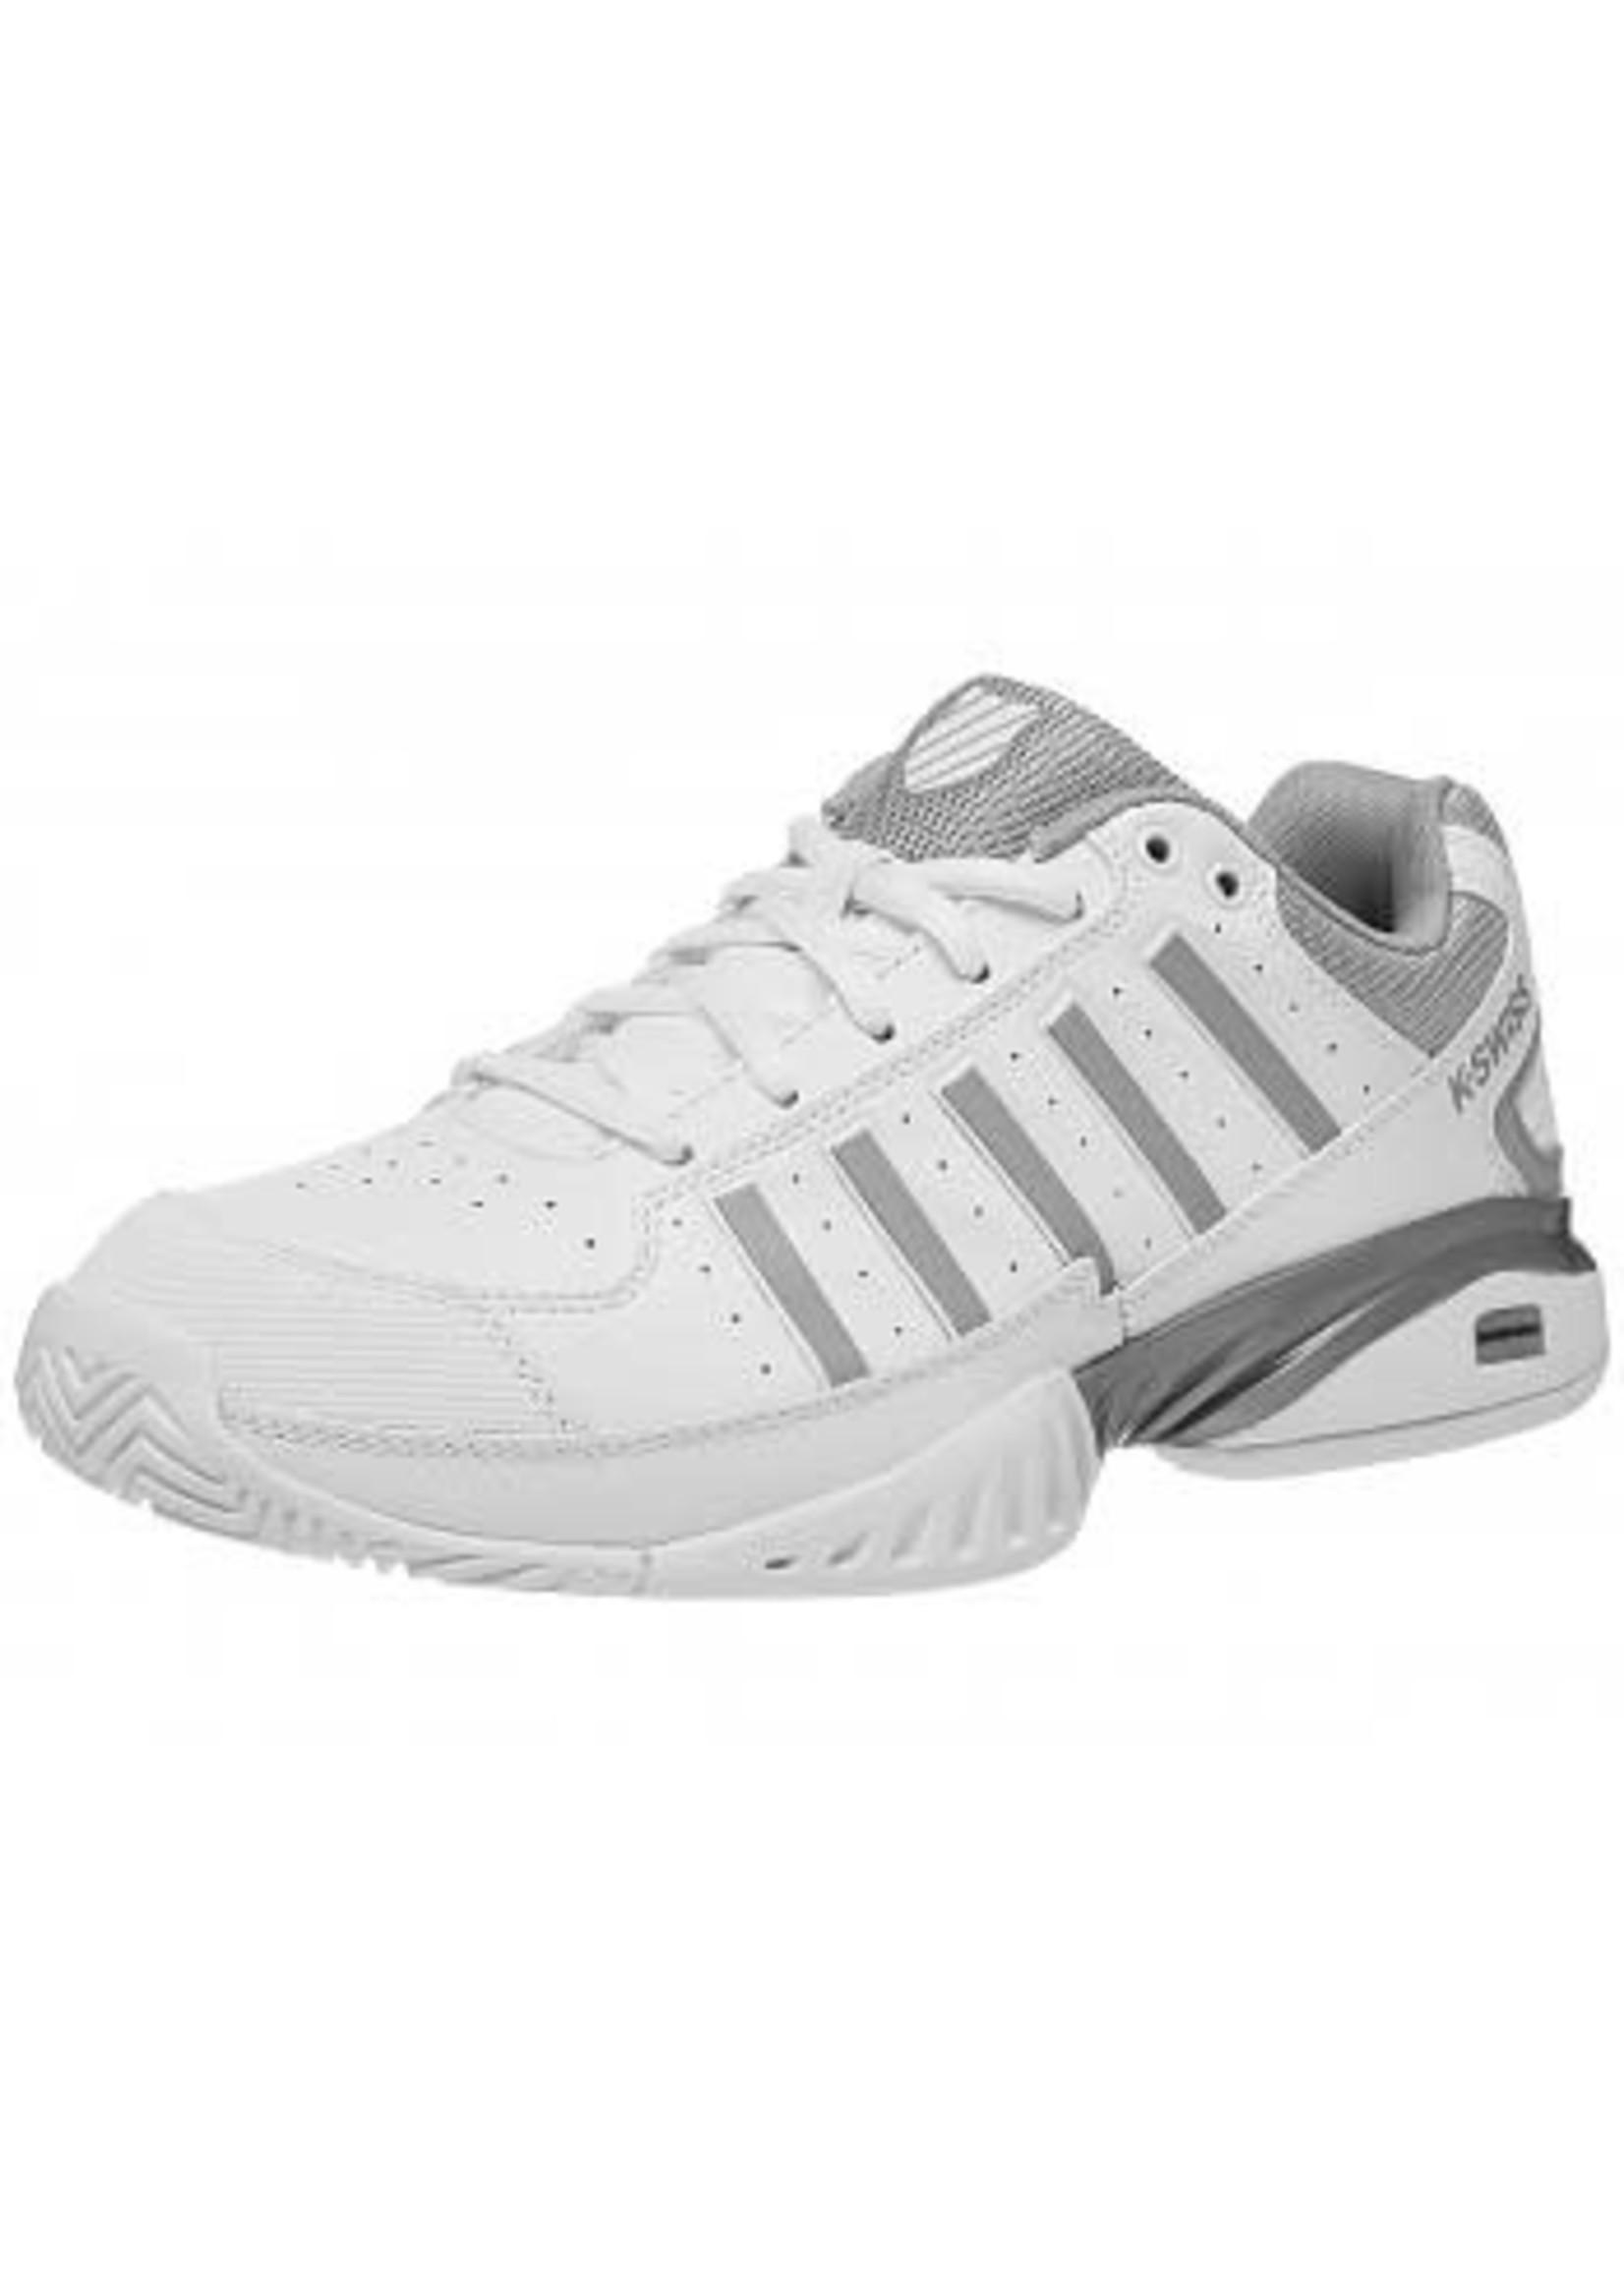 K Swiss Receiver 4 Omni Mens Tennis Shoe [2020]